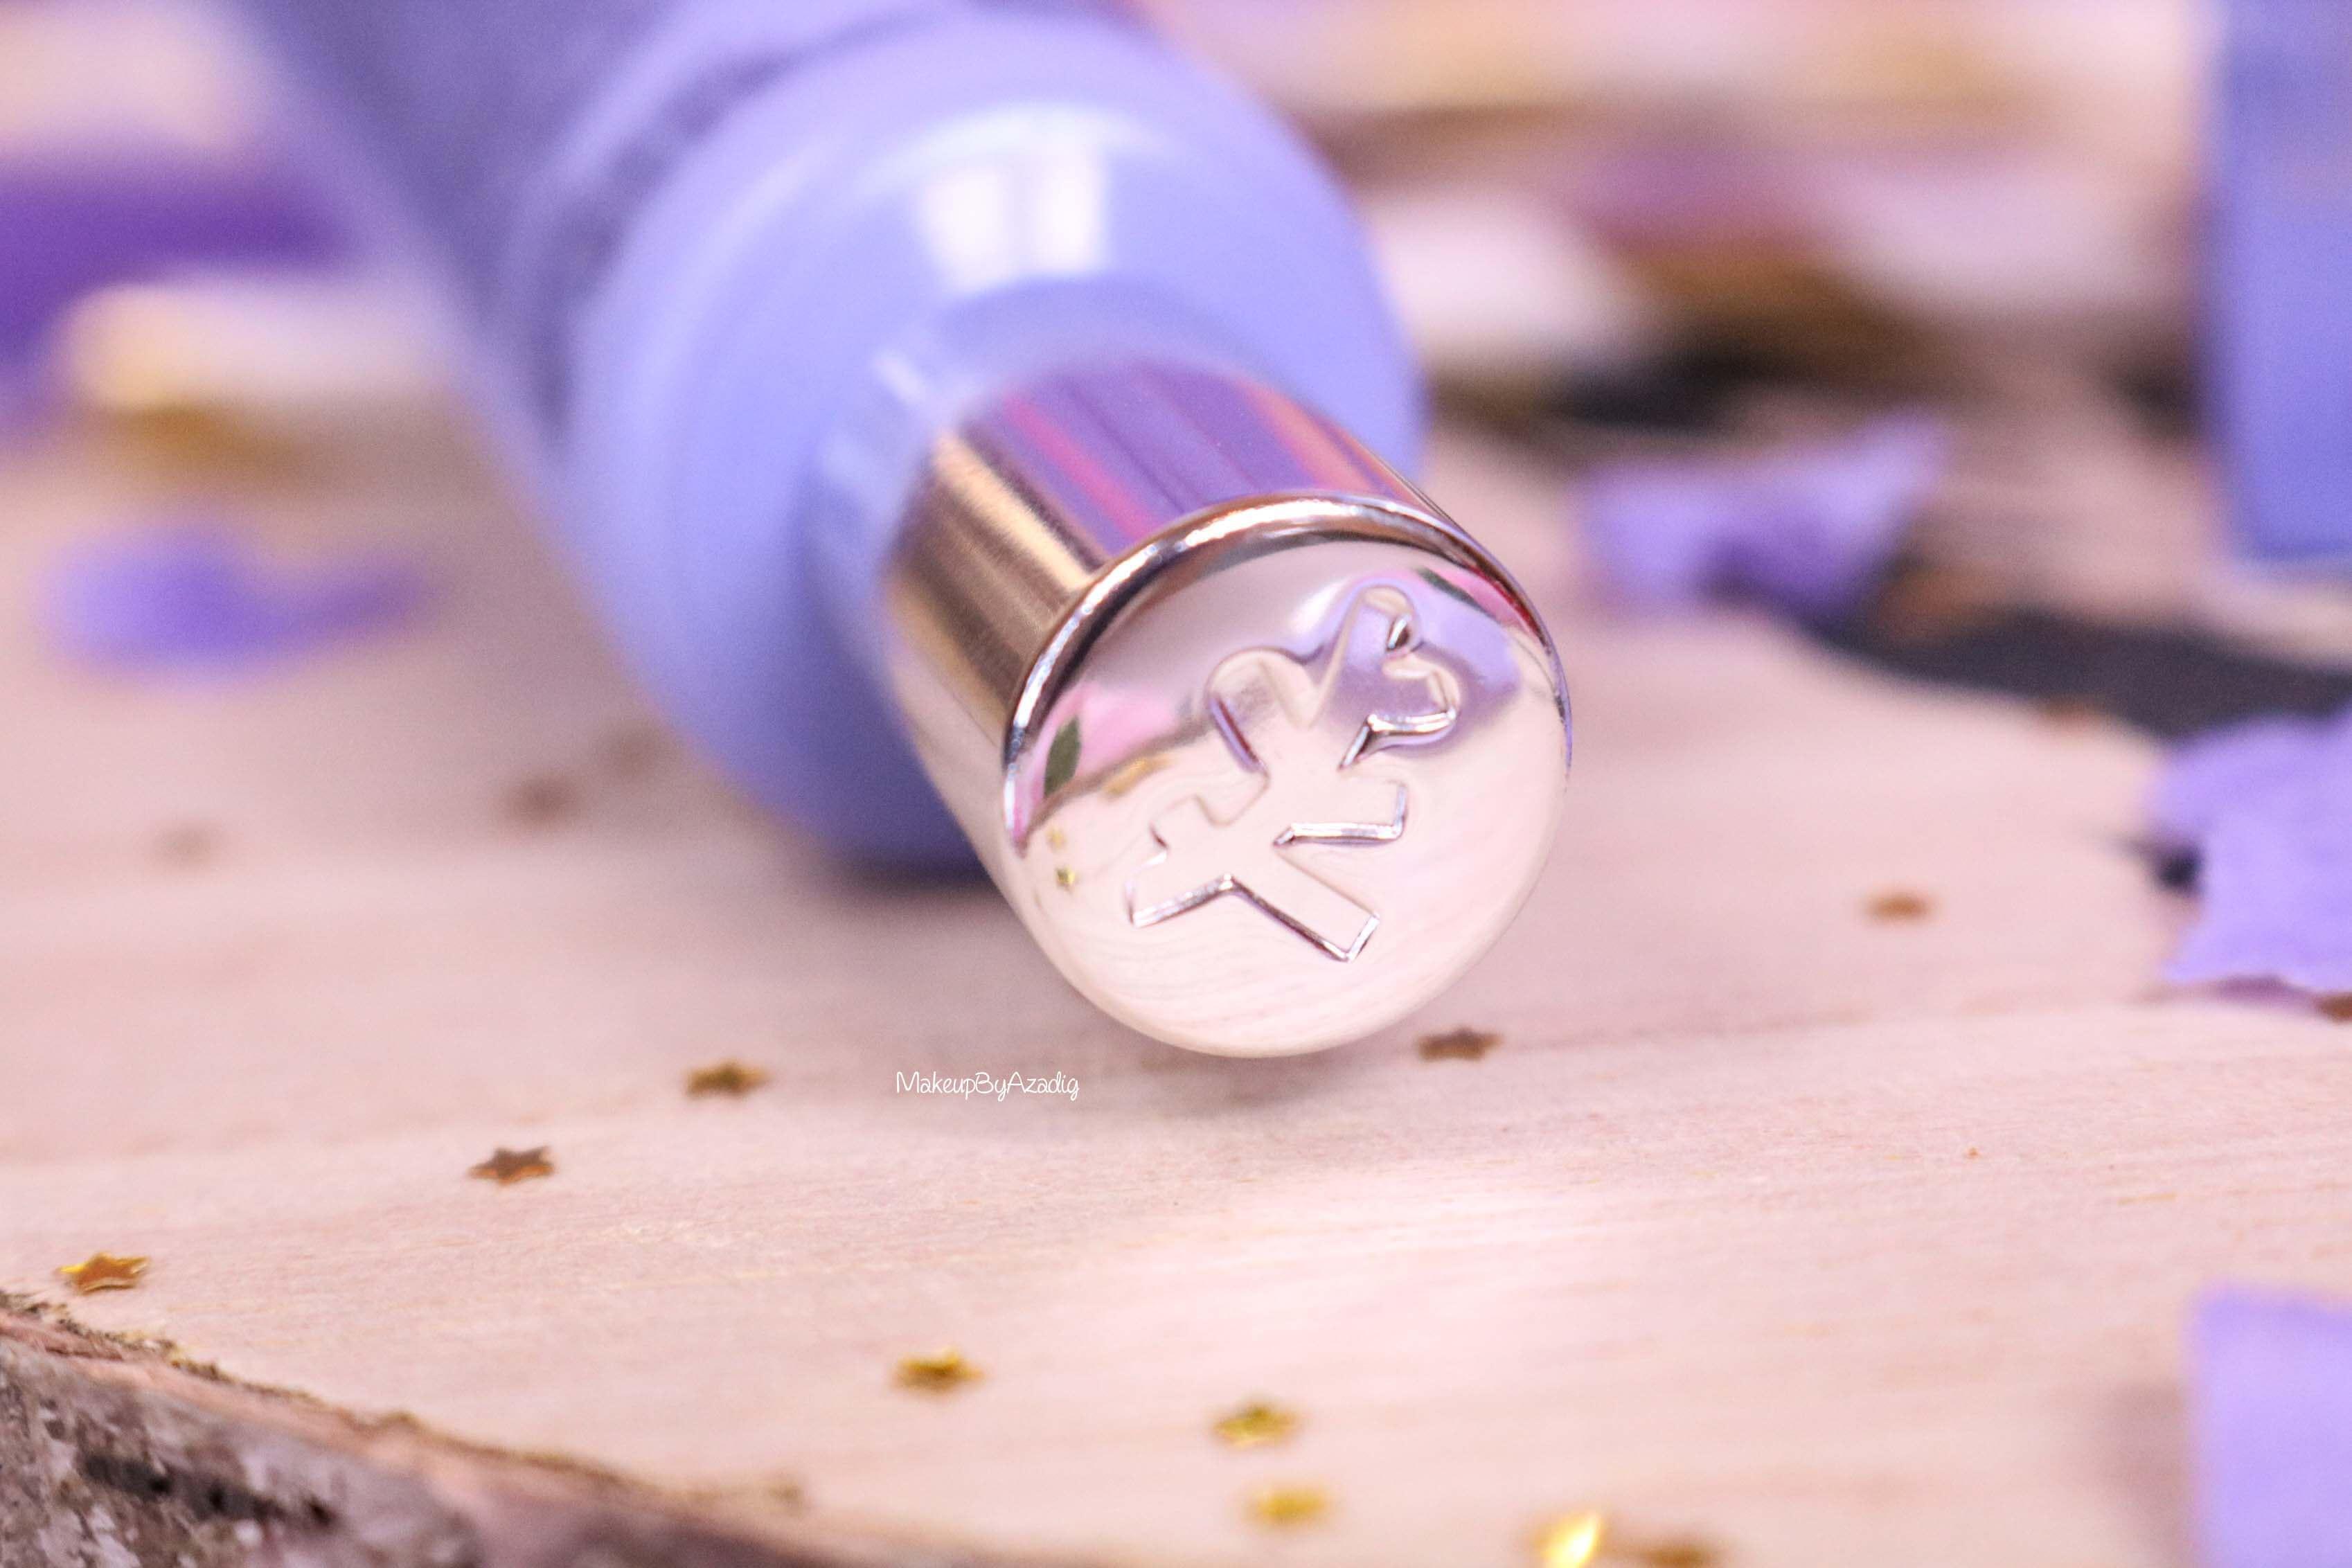 revue-matte-creme-matifiant-floute-erborian-prix-avis-makeupbyazadig-nouveaute-sephora-logo